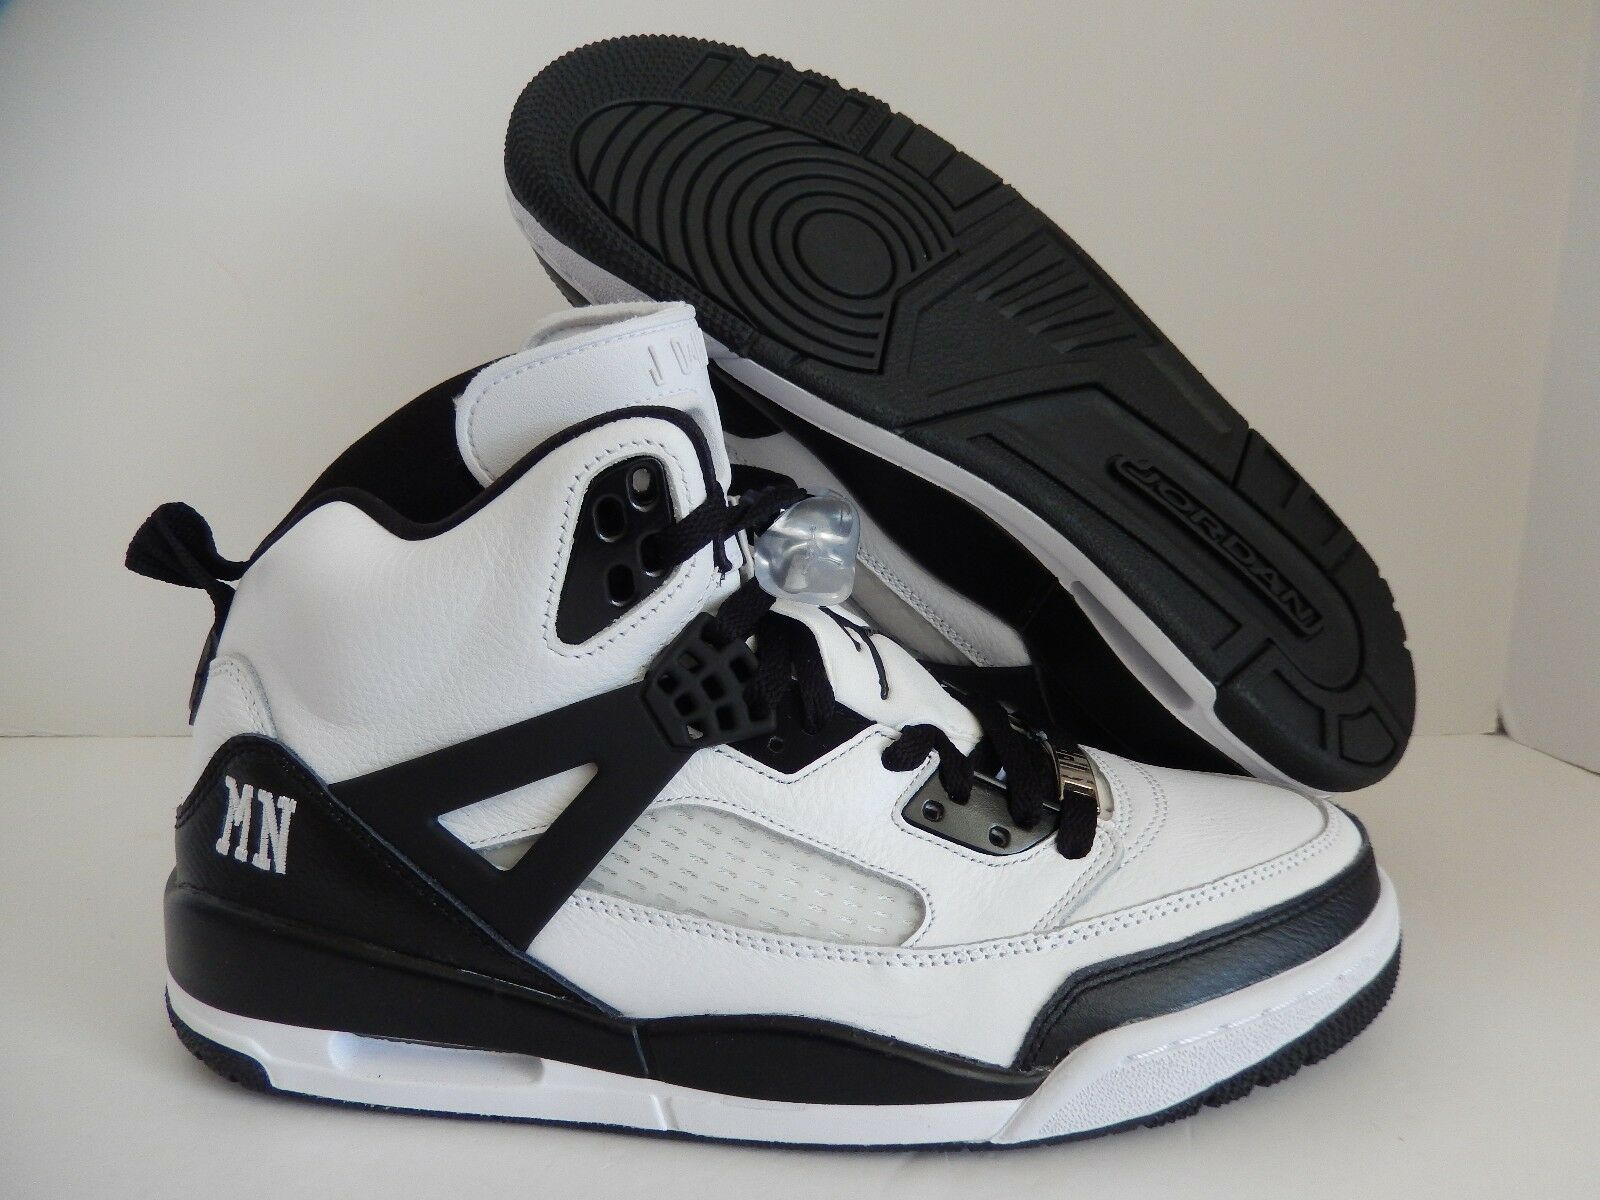 Nike air jordan spizike id WEISS-schwarz sz 10,5 [605236-999]